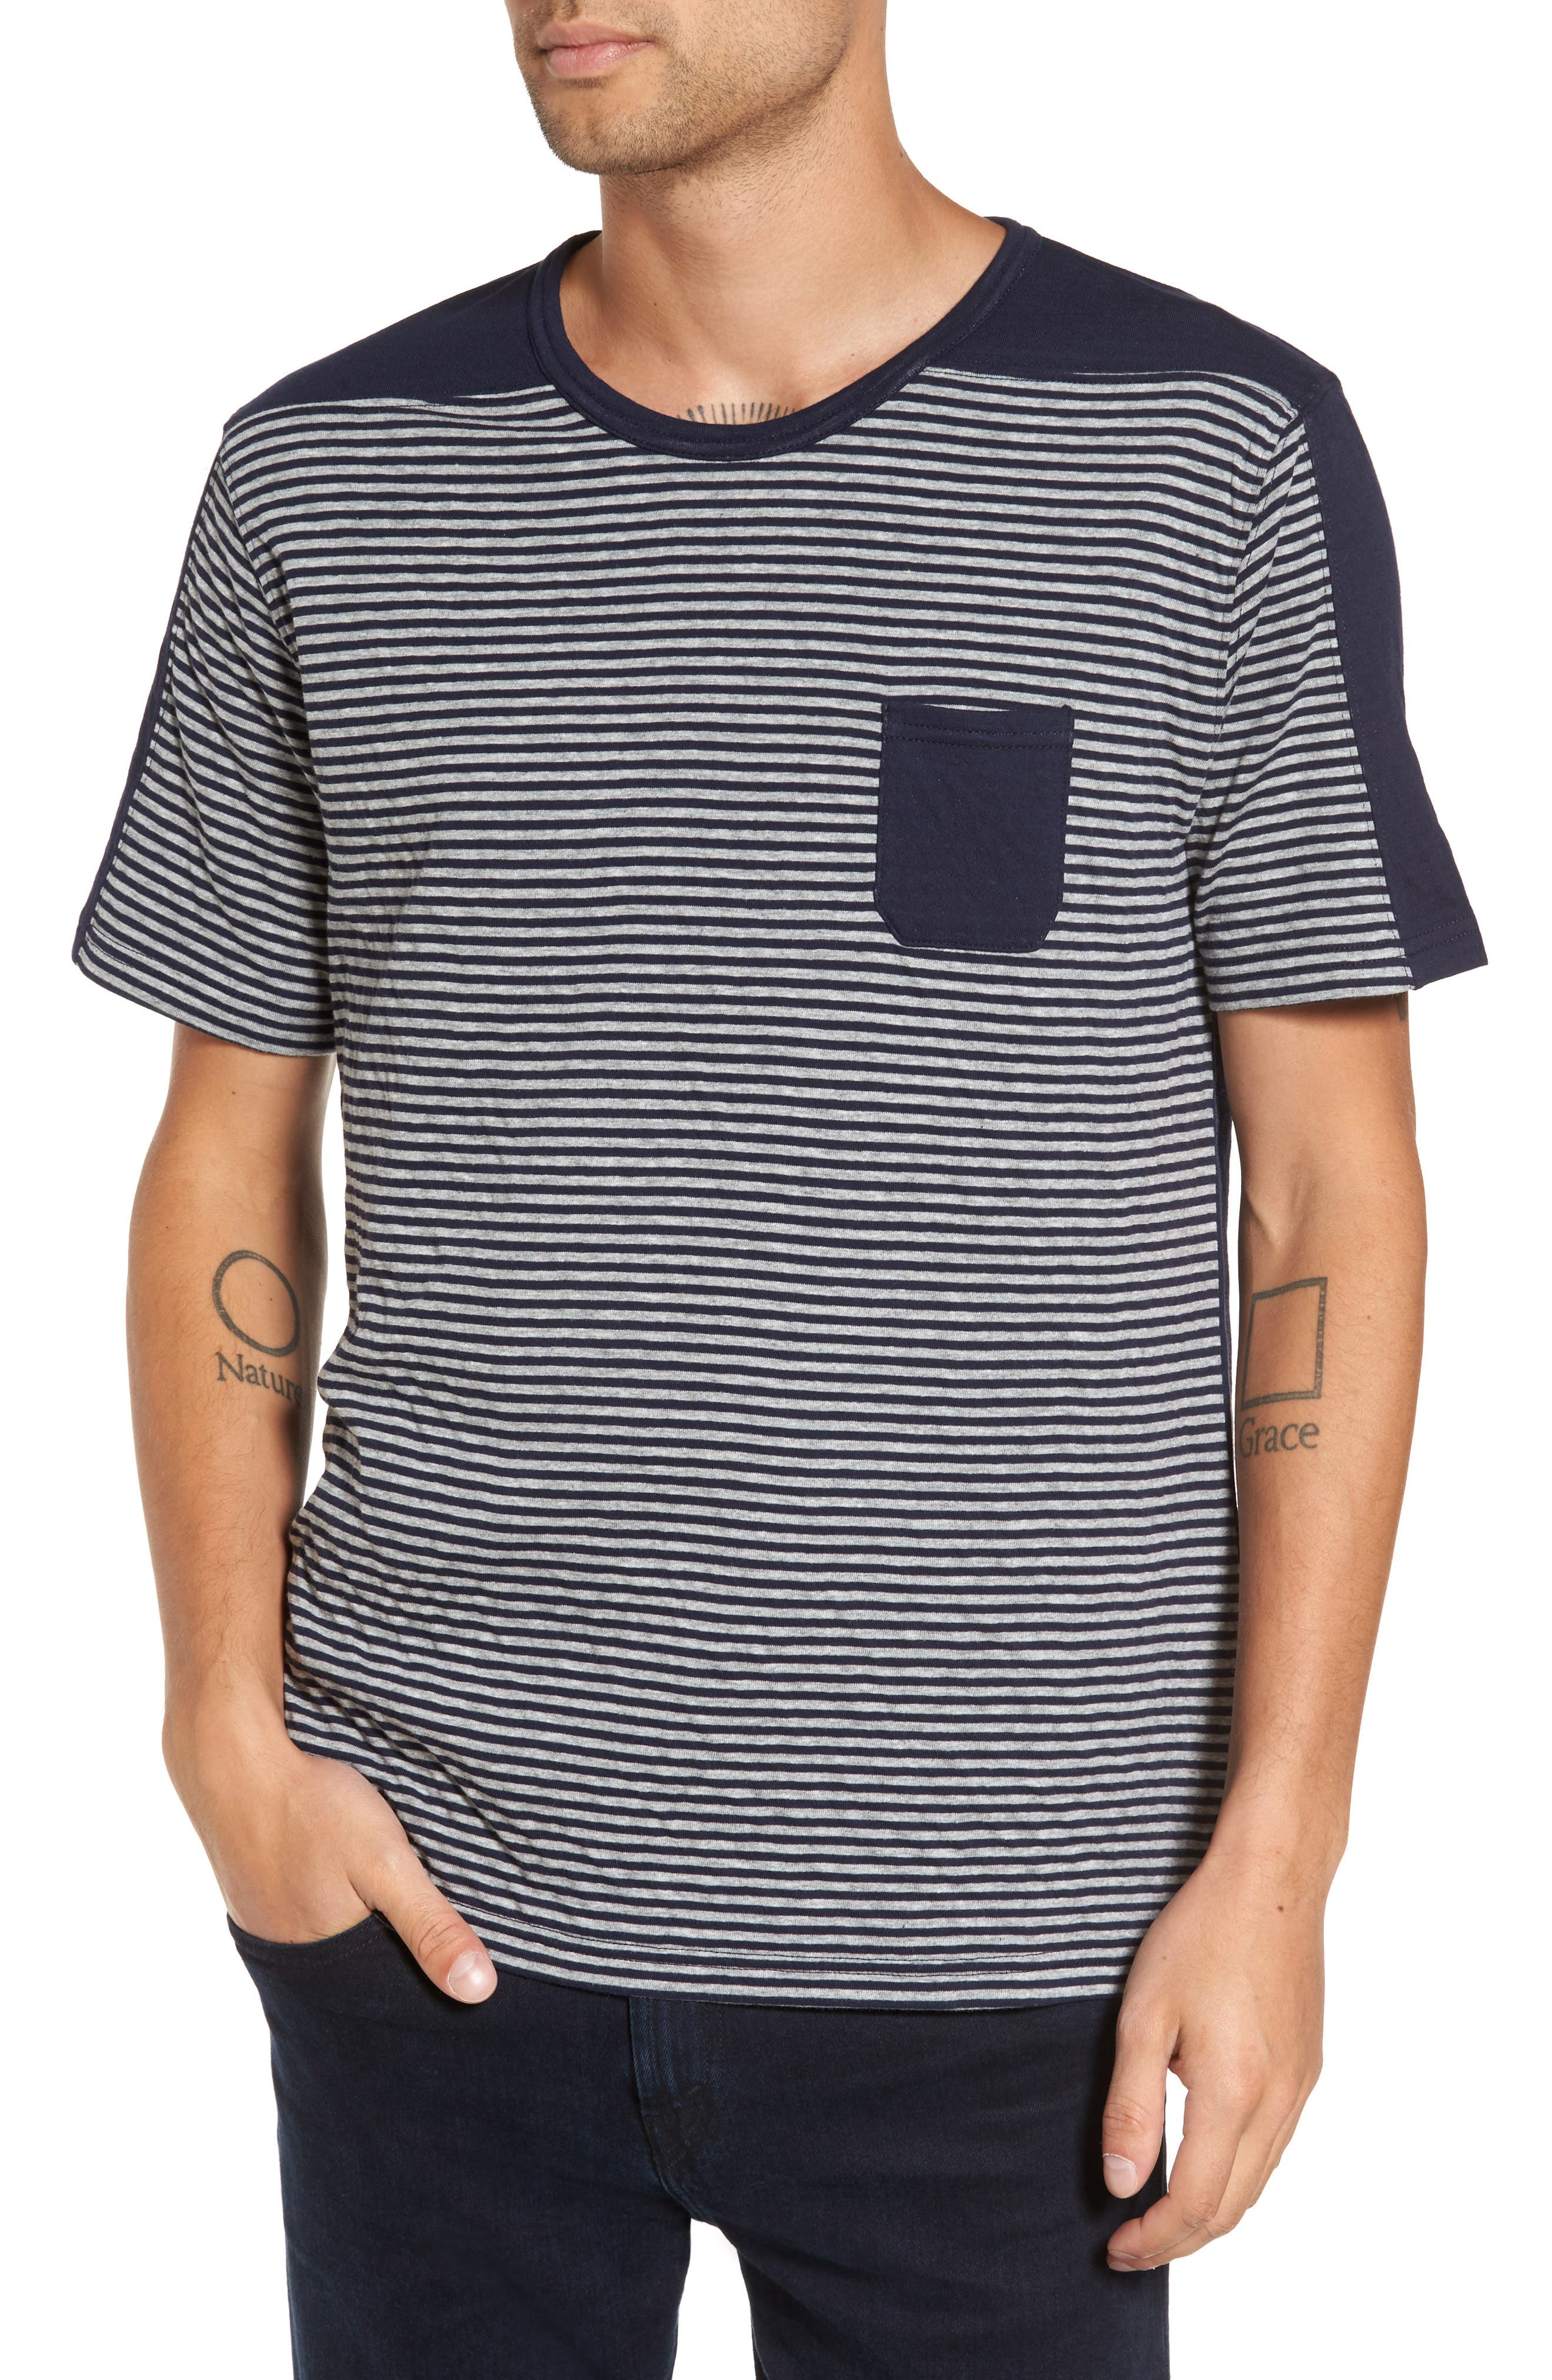 Slate & Stone Striped Pocket T-Shirt